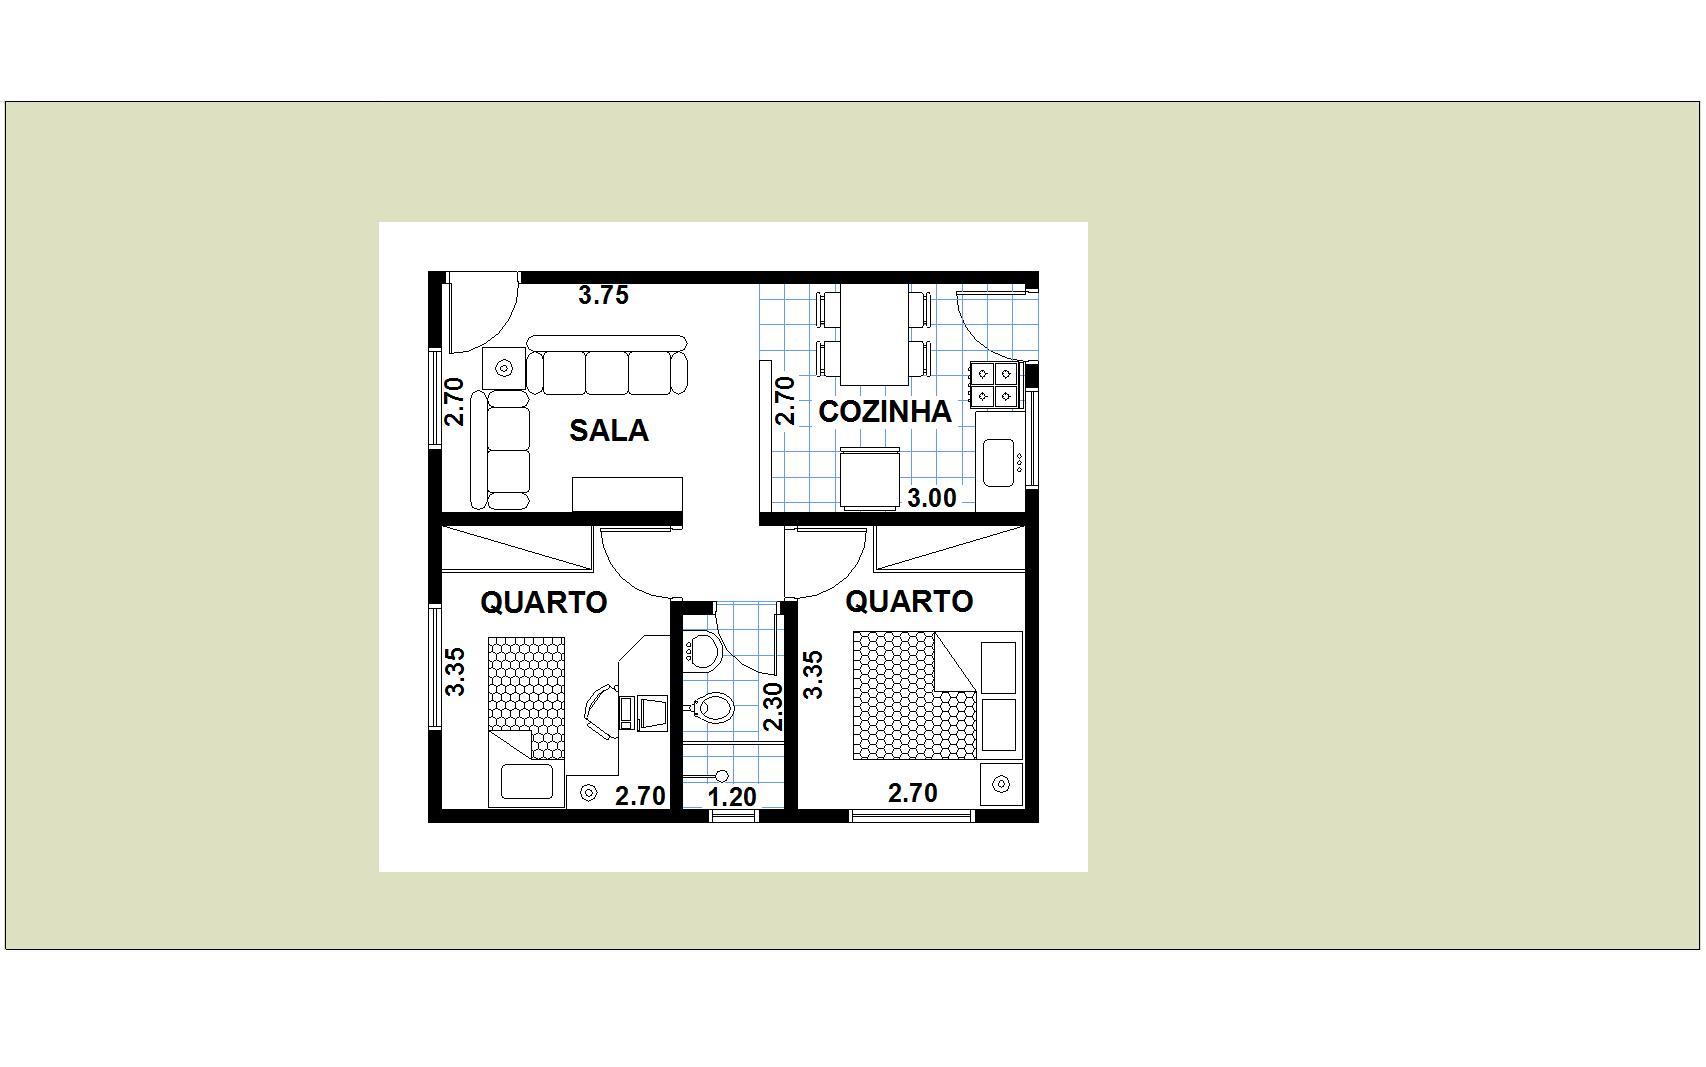 Pin Planta De Casa Com 2 Quartos on Pinterest #7F8249 1706 1067